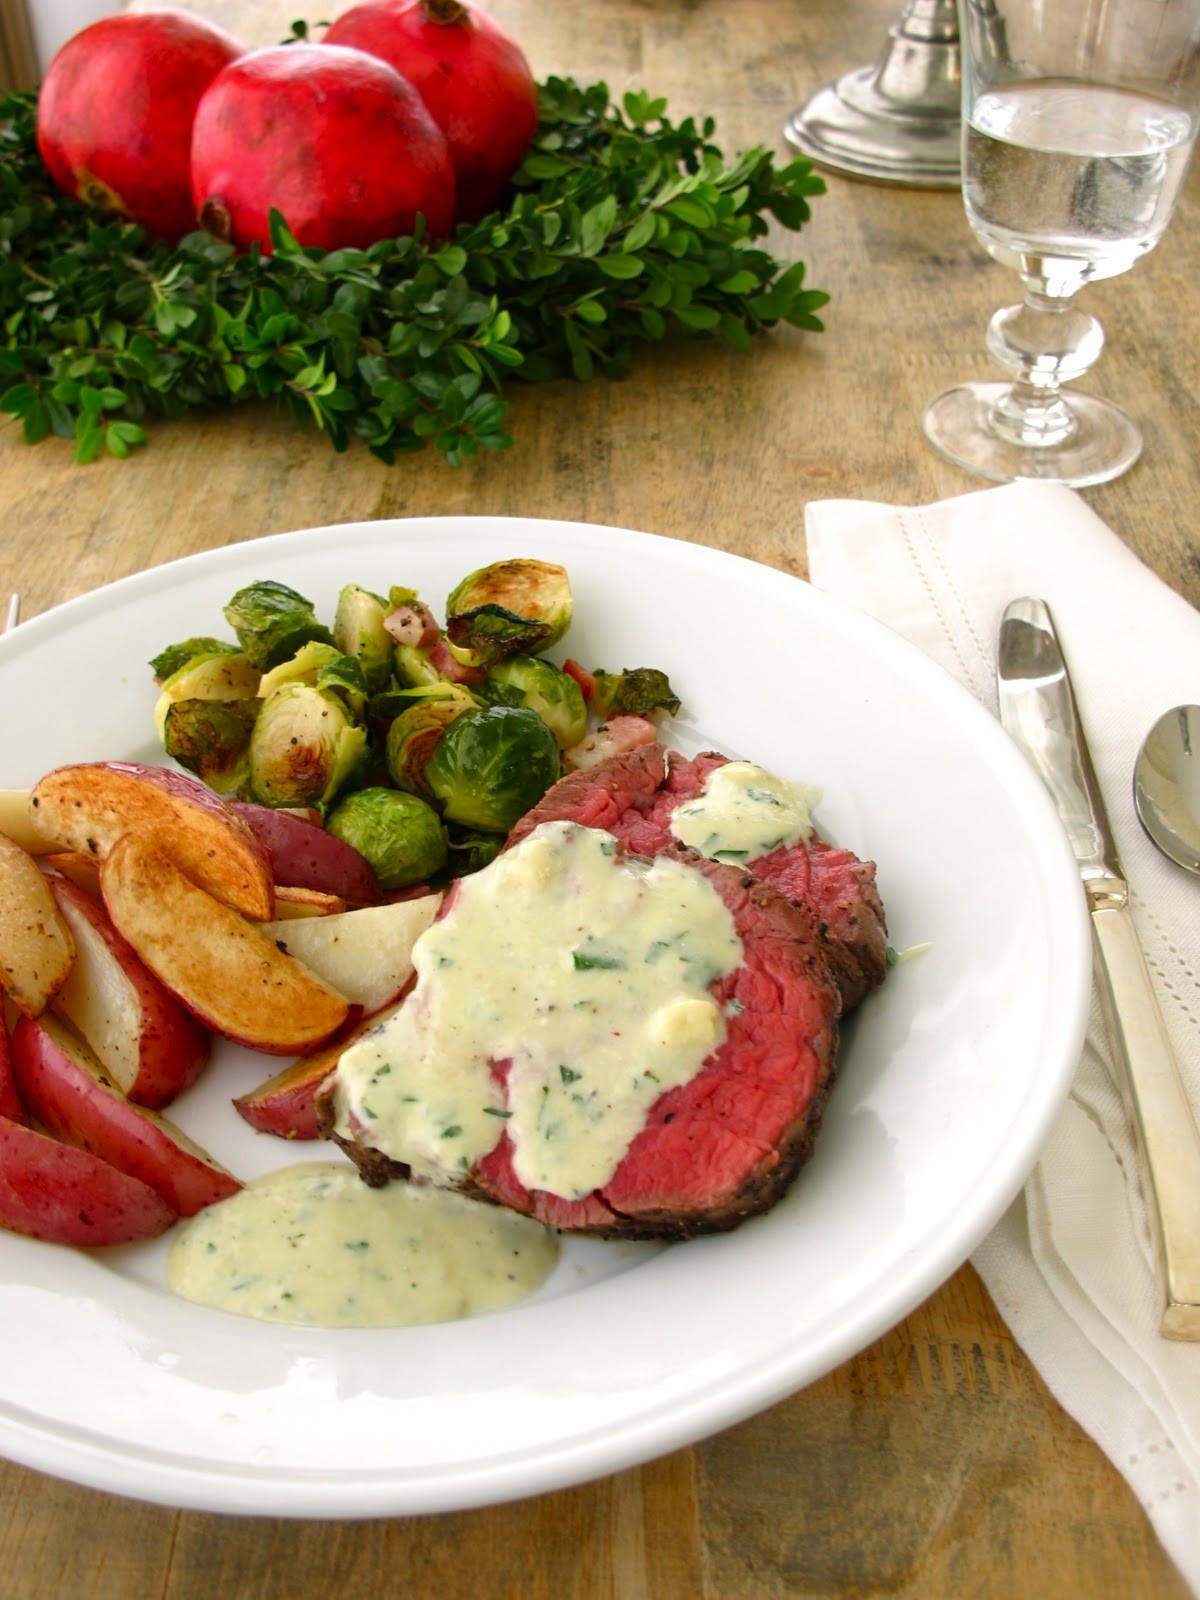 Beef Tenderloin Christmas Dinner  Jenny Steffens Hobick Blue Cheese Sauce for Beef